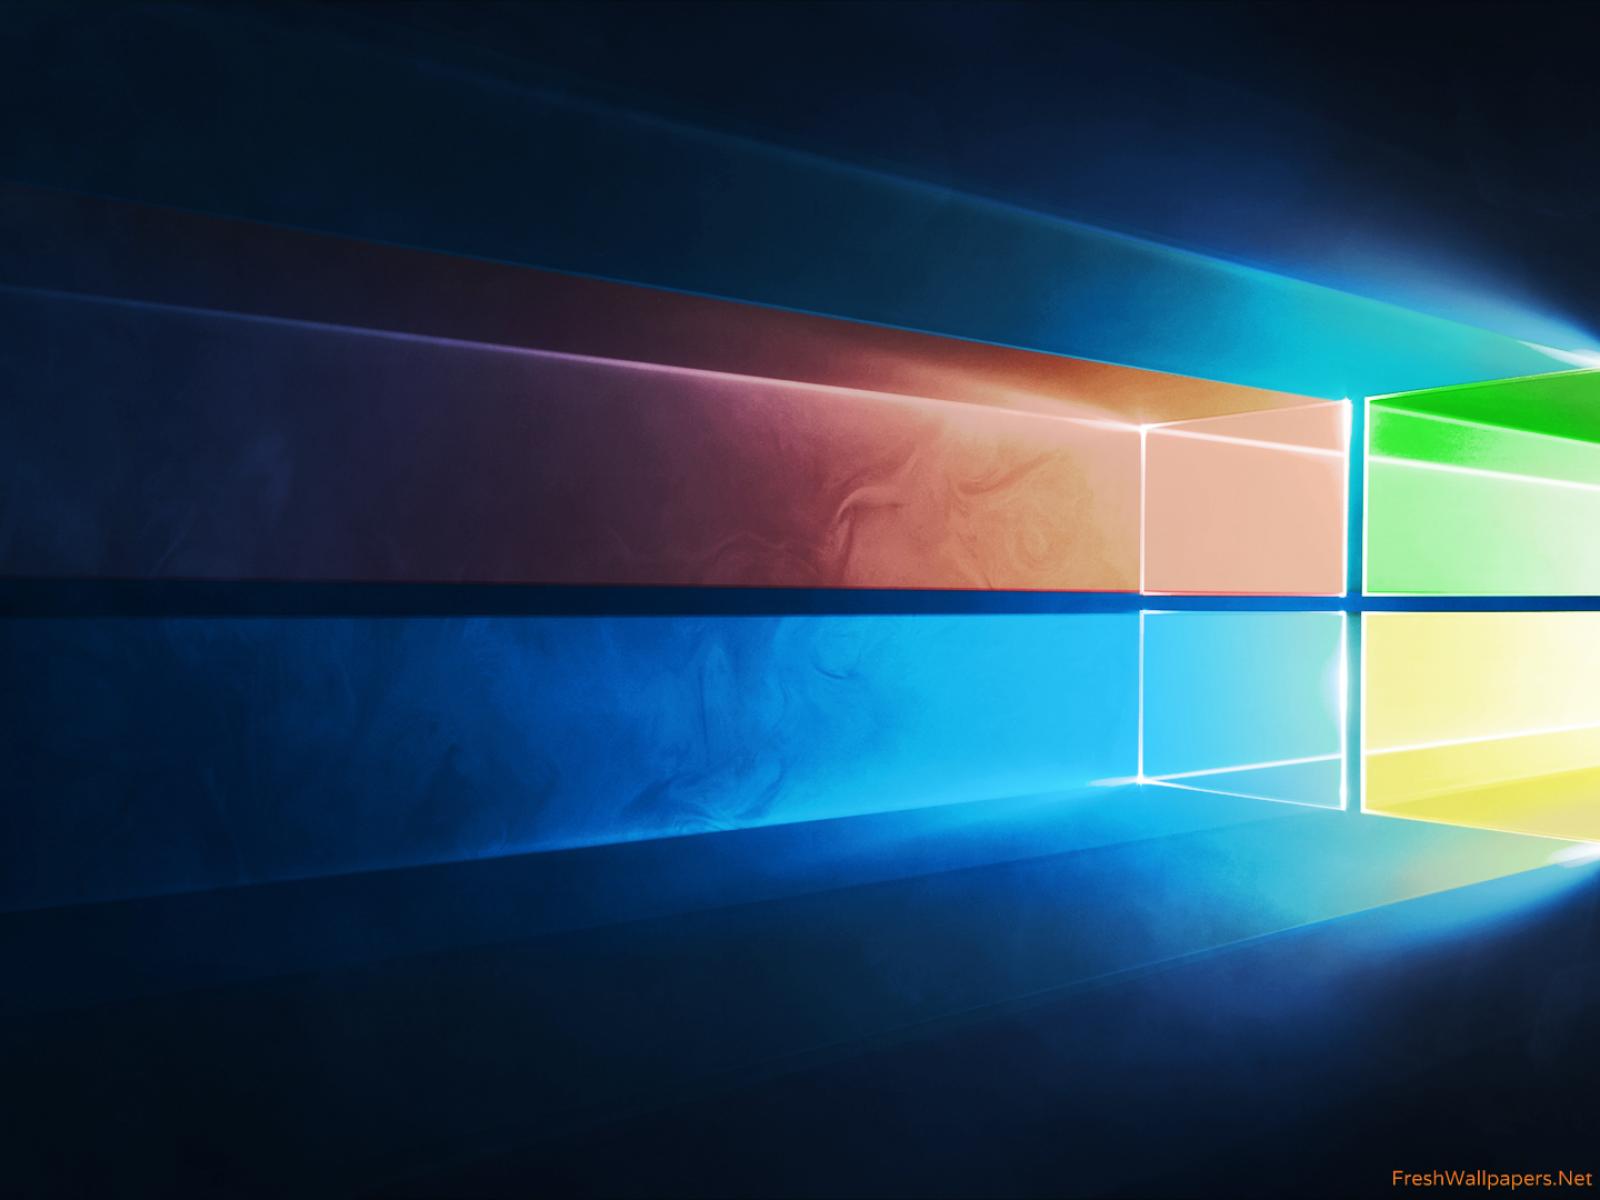 windows 10 wallpaper 1080p,blue,light,sky,lighting,line